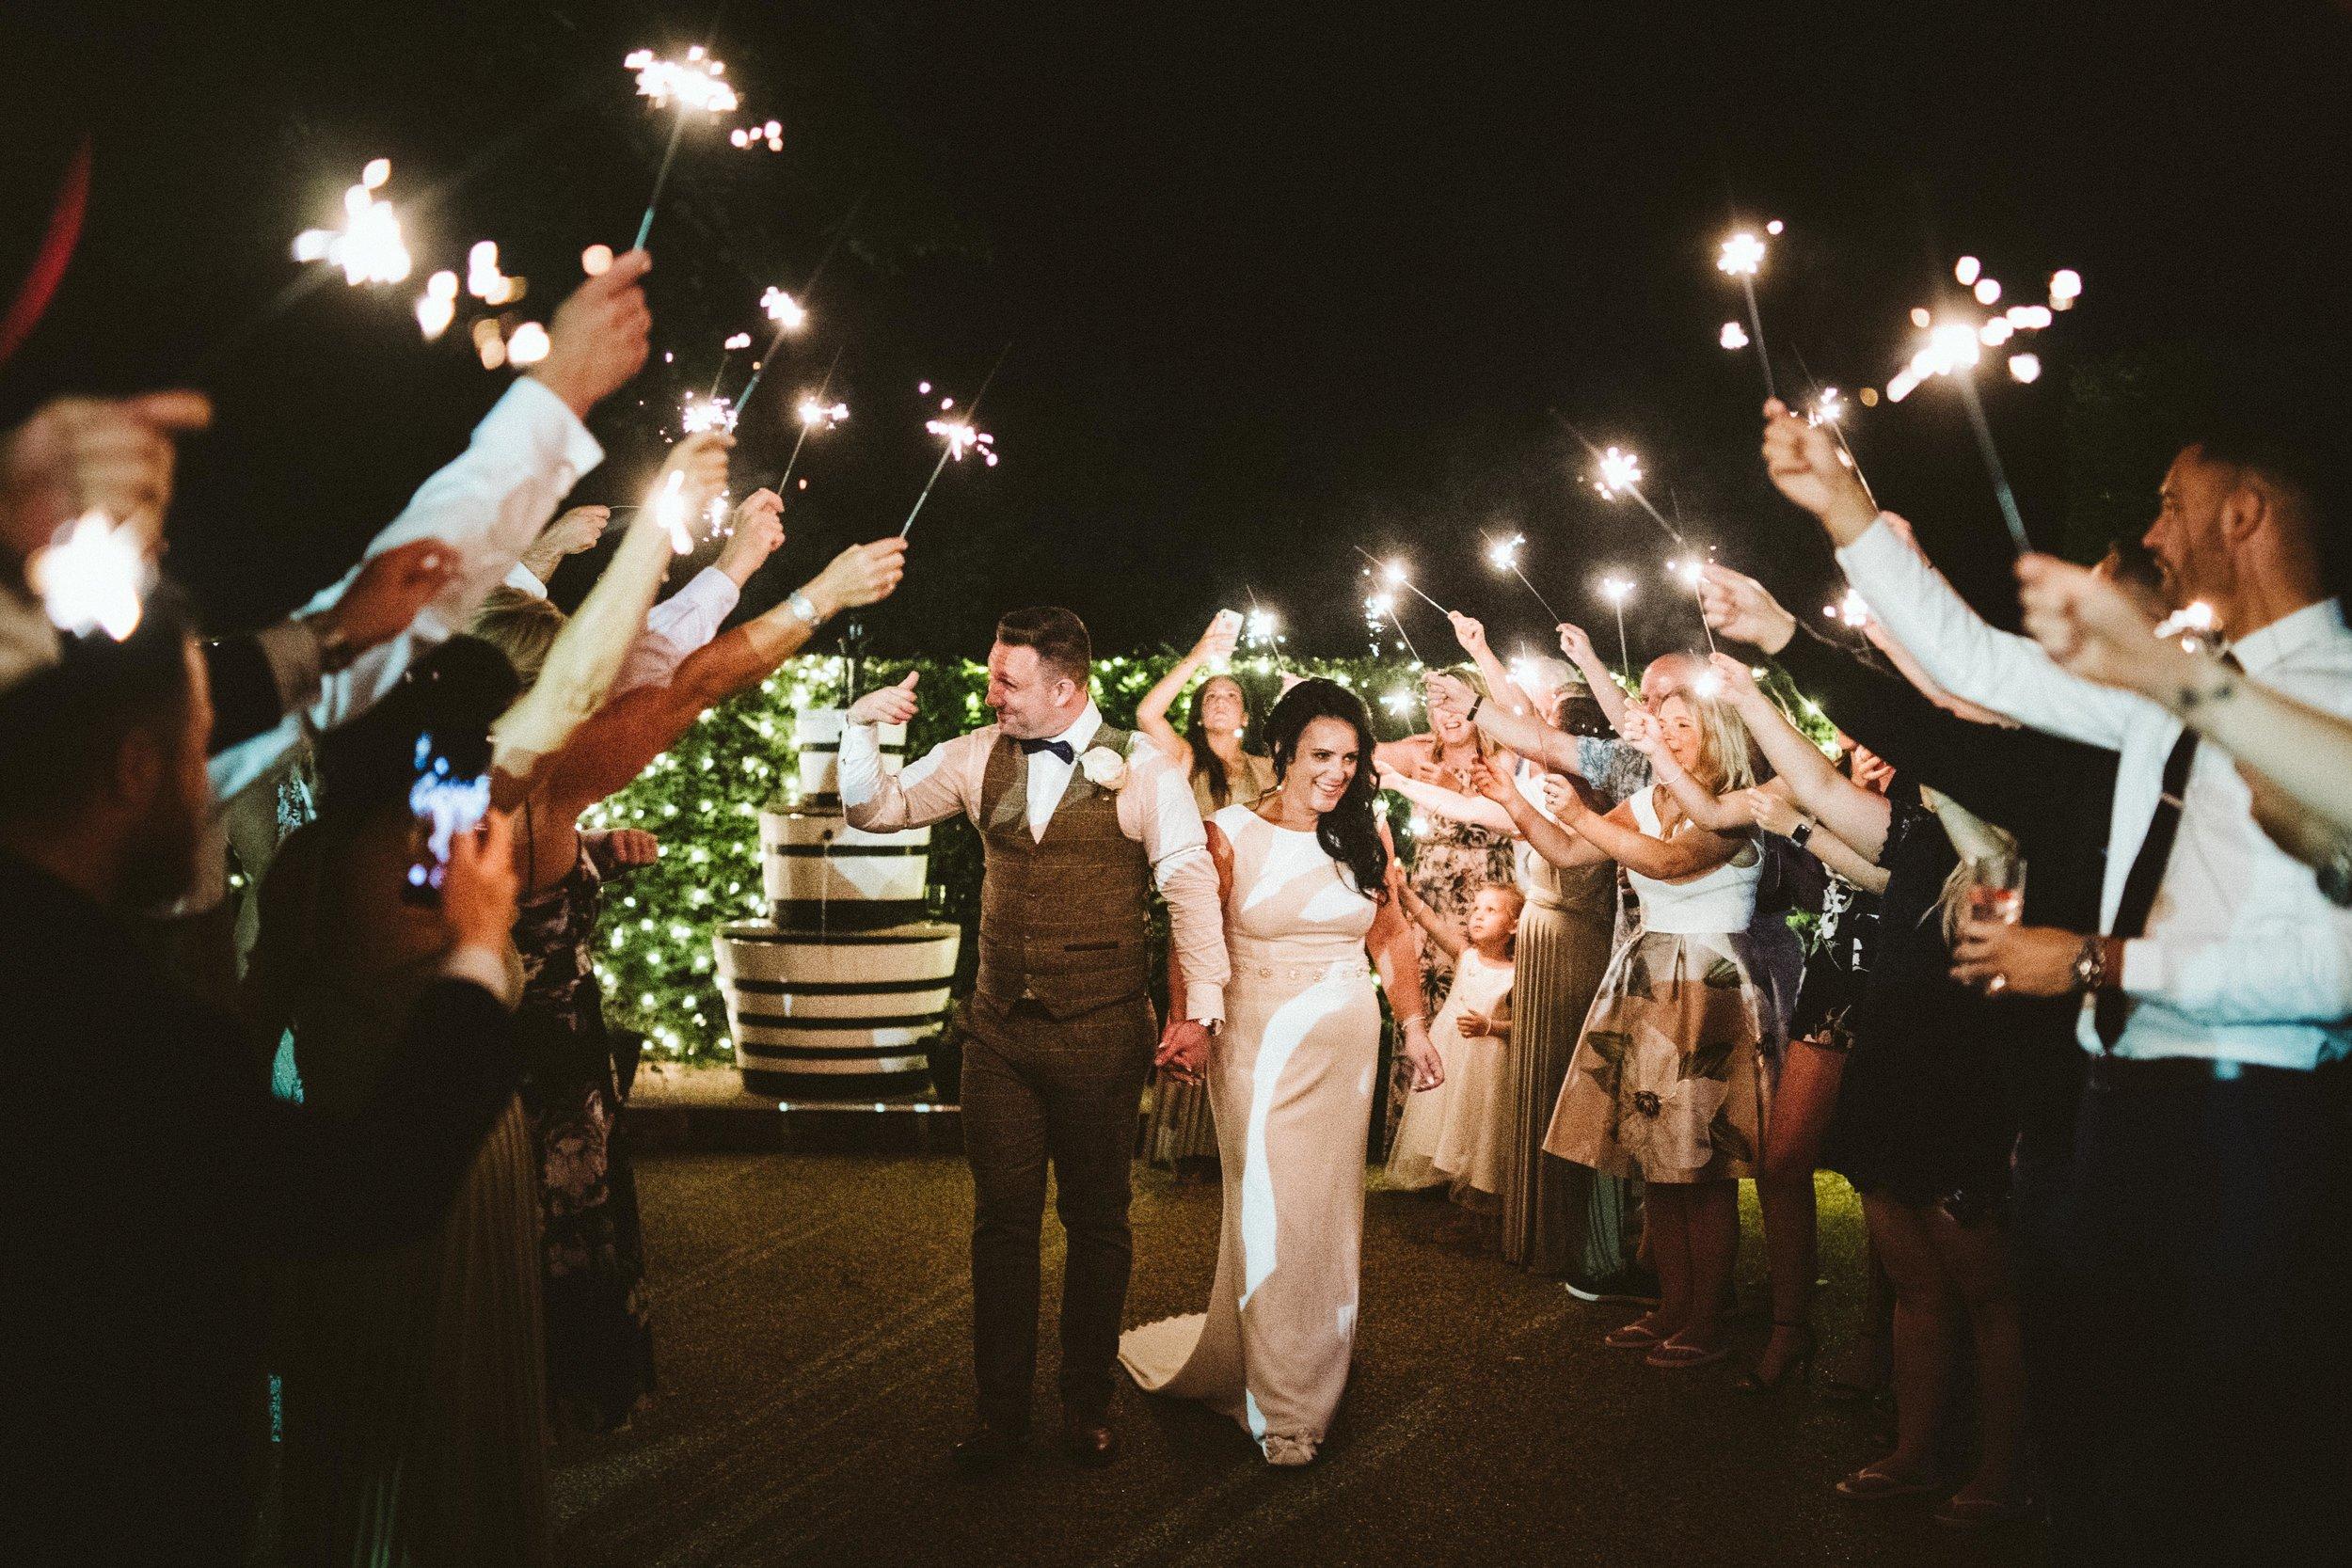 kent-wedding-photography-06179.jpg